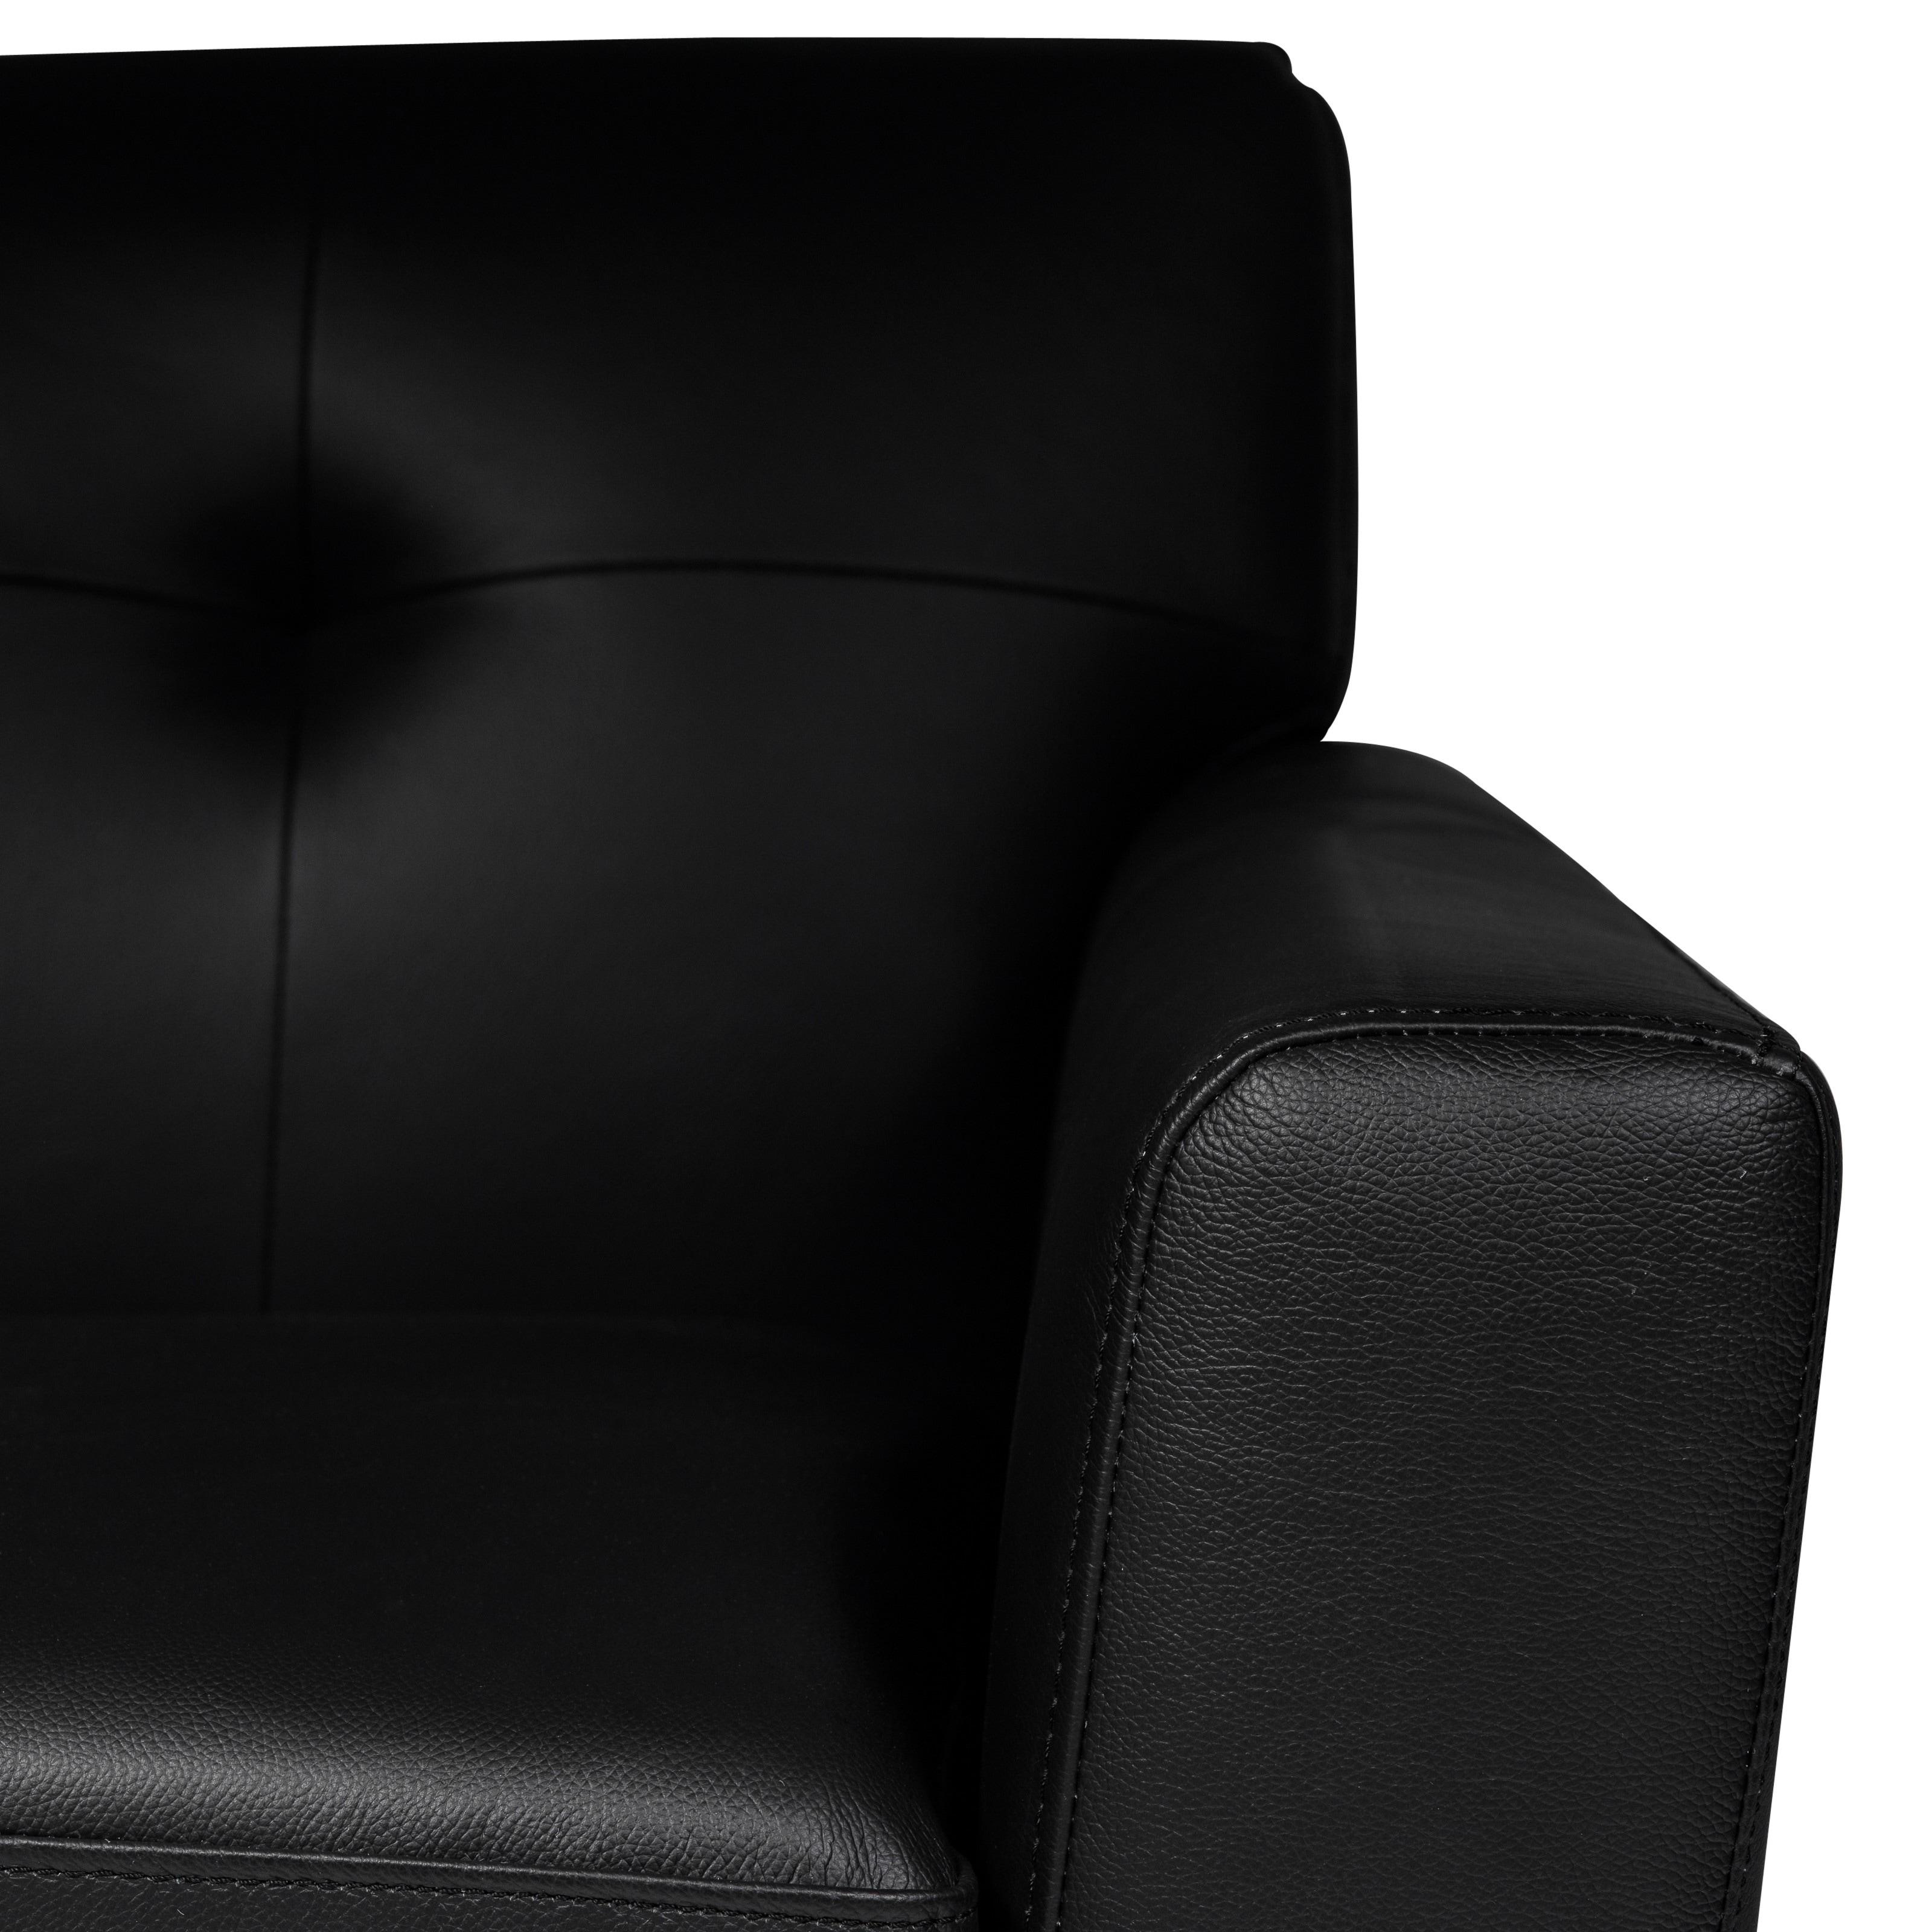 LeisureMod Luray Tufted Sofa with Walnut Oak Base in Black Leather